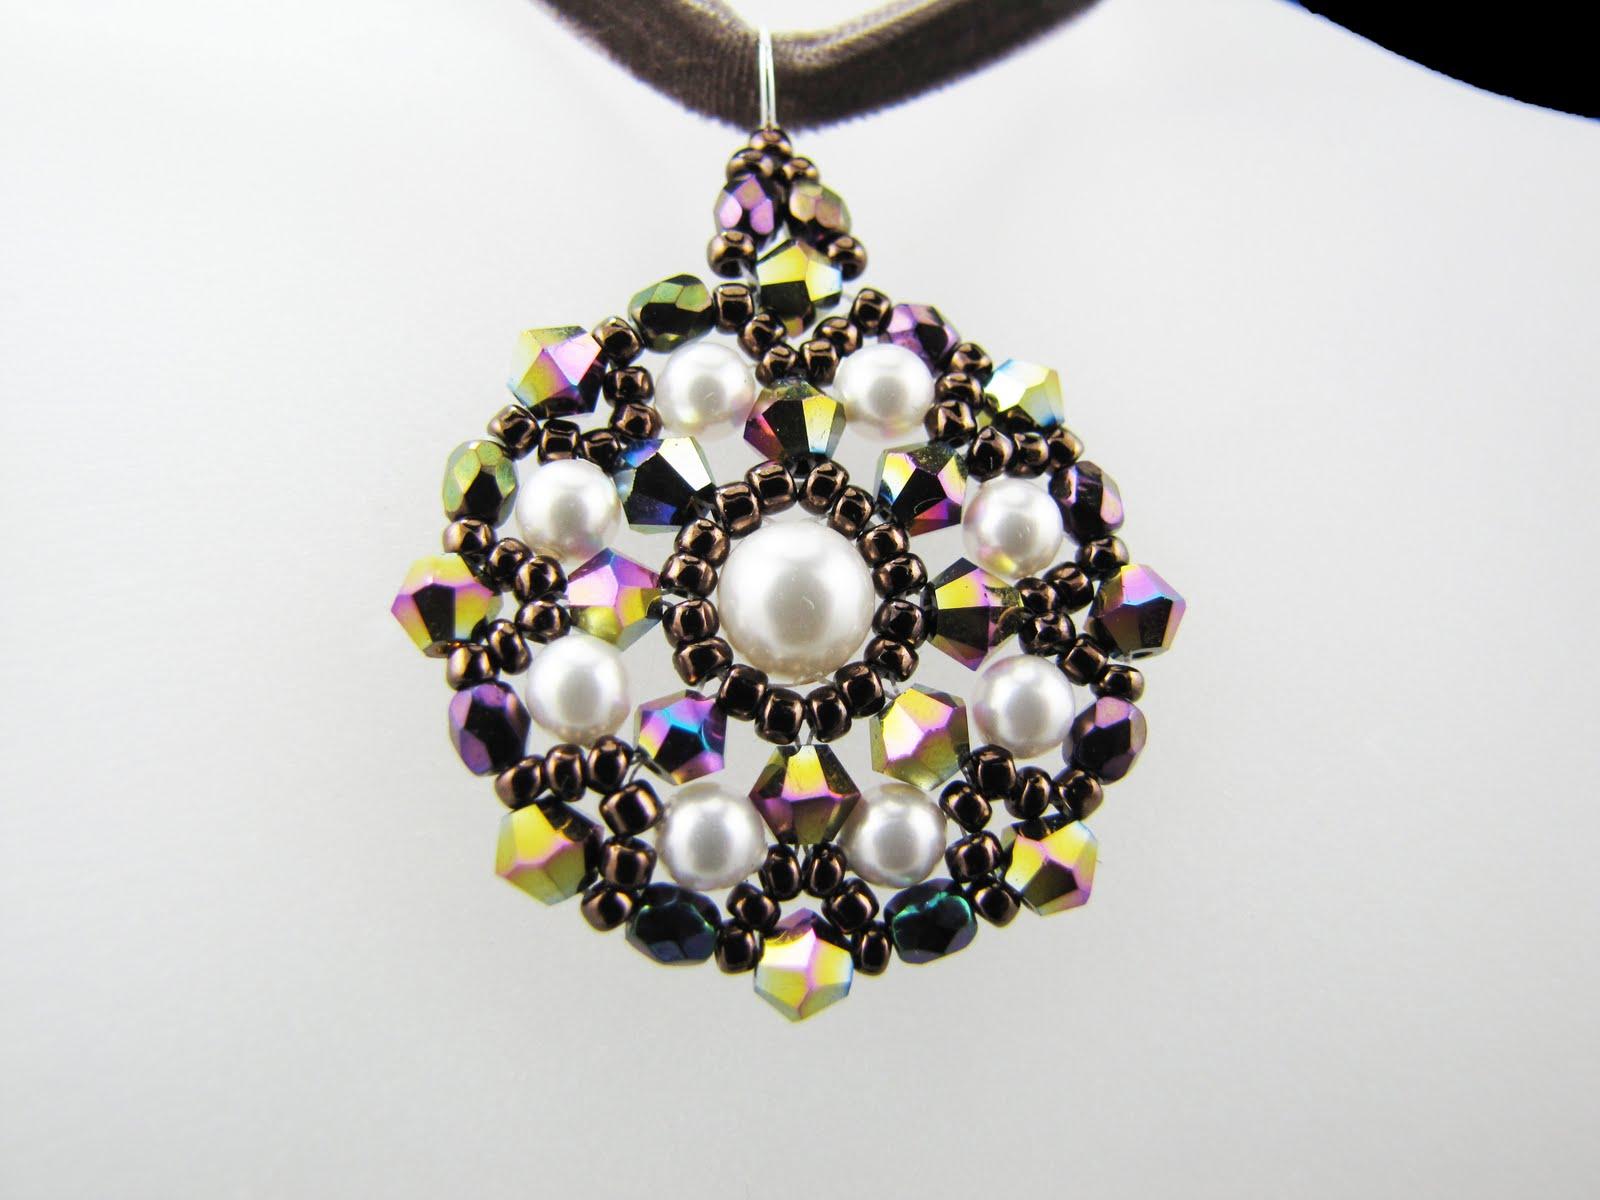 Swarovski topaz crystal pearls beaded woven pendant necklace